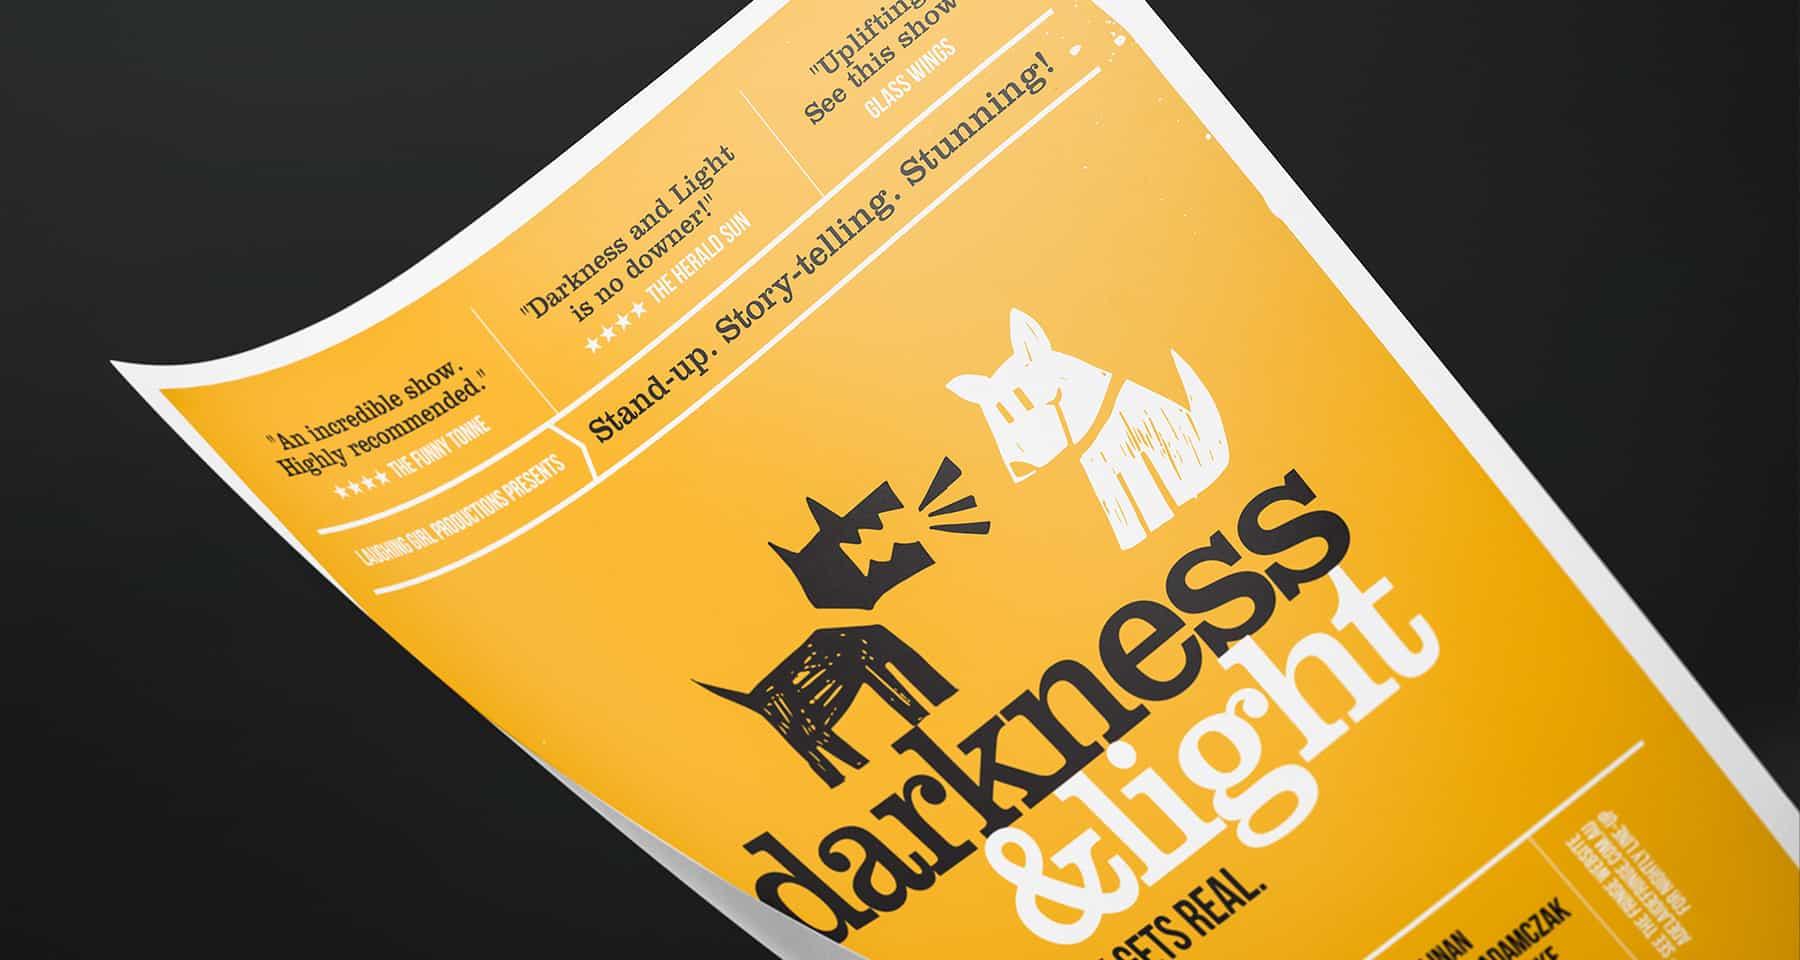 Darkness & Light Event Branding